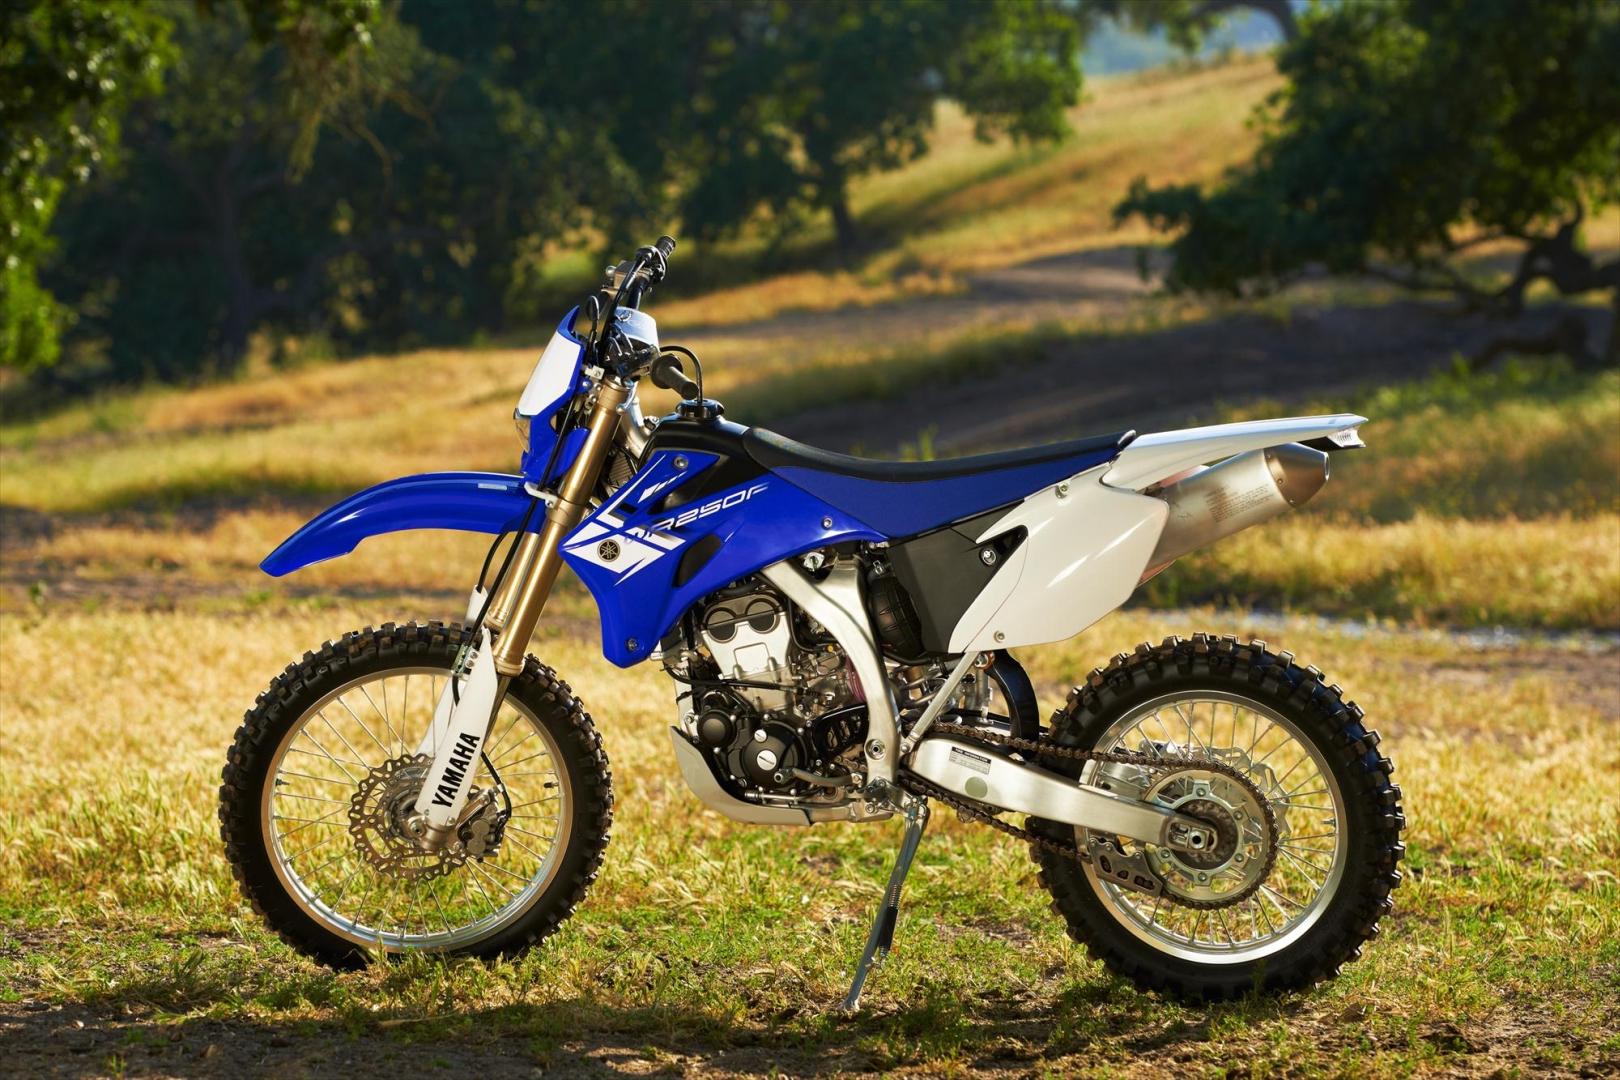 2013 Yamaha Wr250f The Fun Off Road Bike With Racing